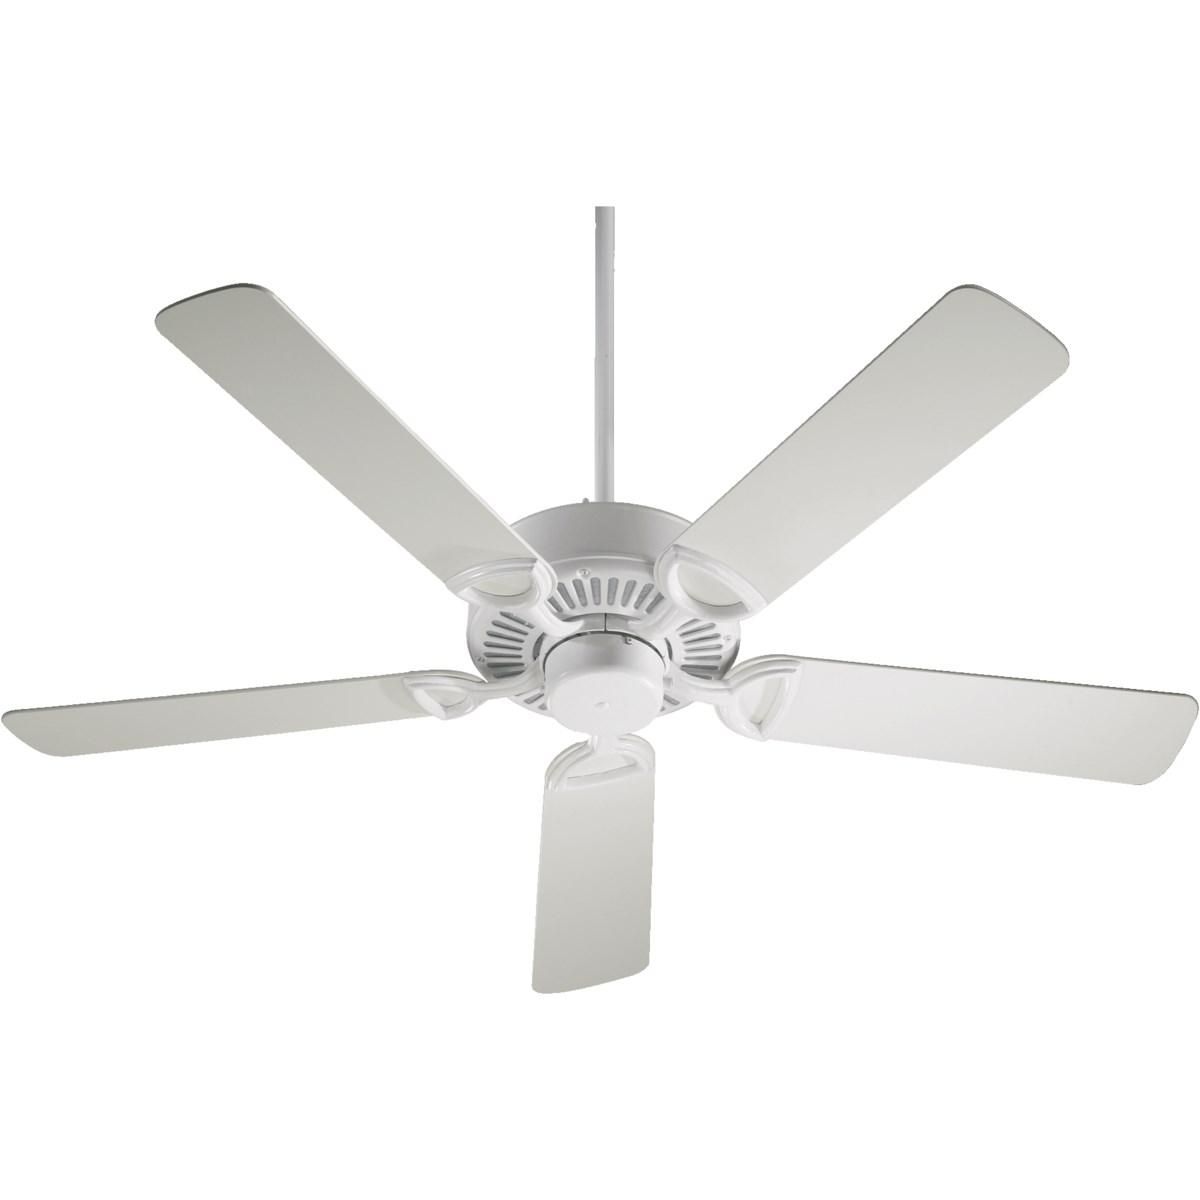 Estate 52-in 5 Blade Studio White Traditional Ceiling Fan